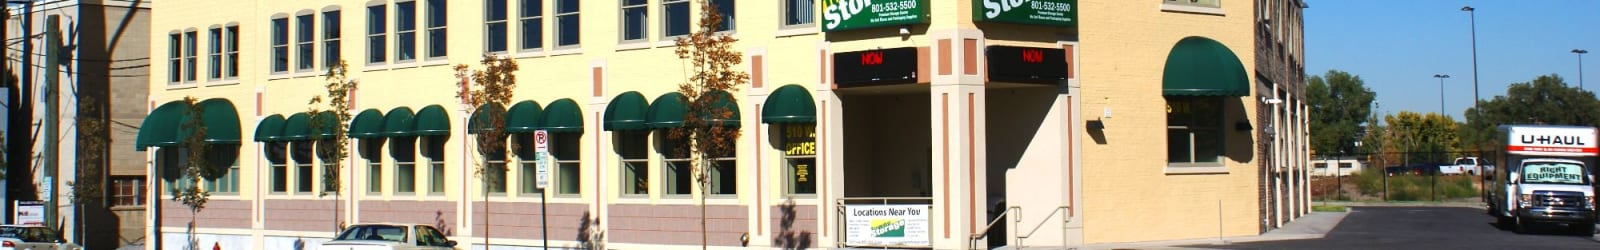 Forms for Towne Storage - Gateway in Salt Lake City, Utah